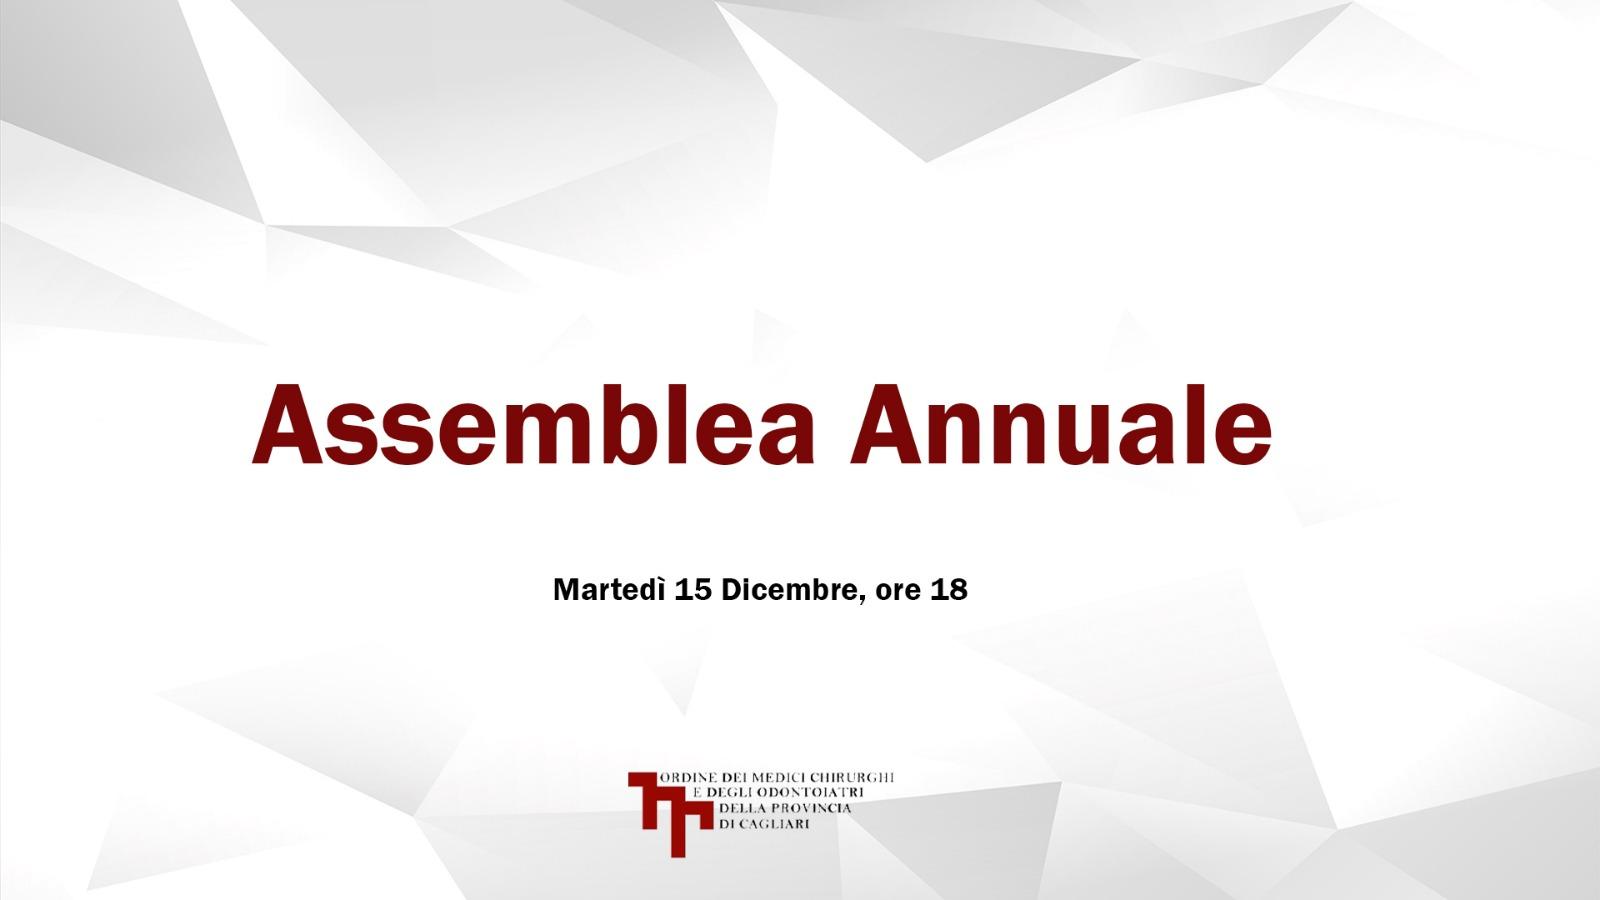 Assemblea Annuale 2020